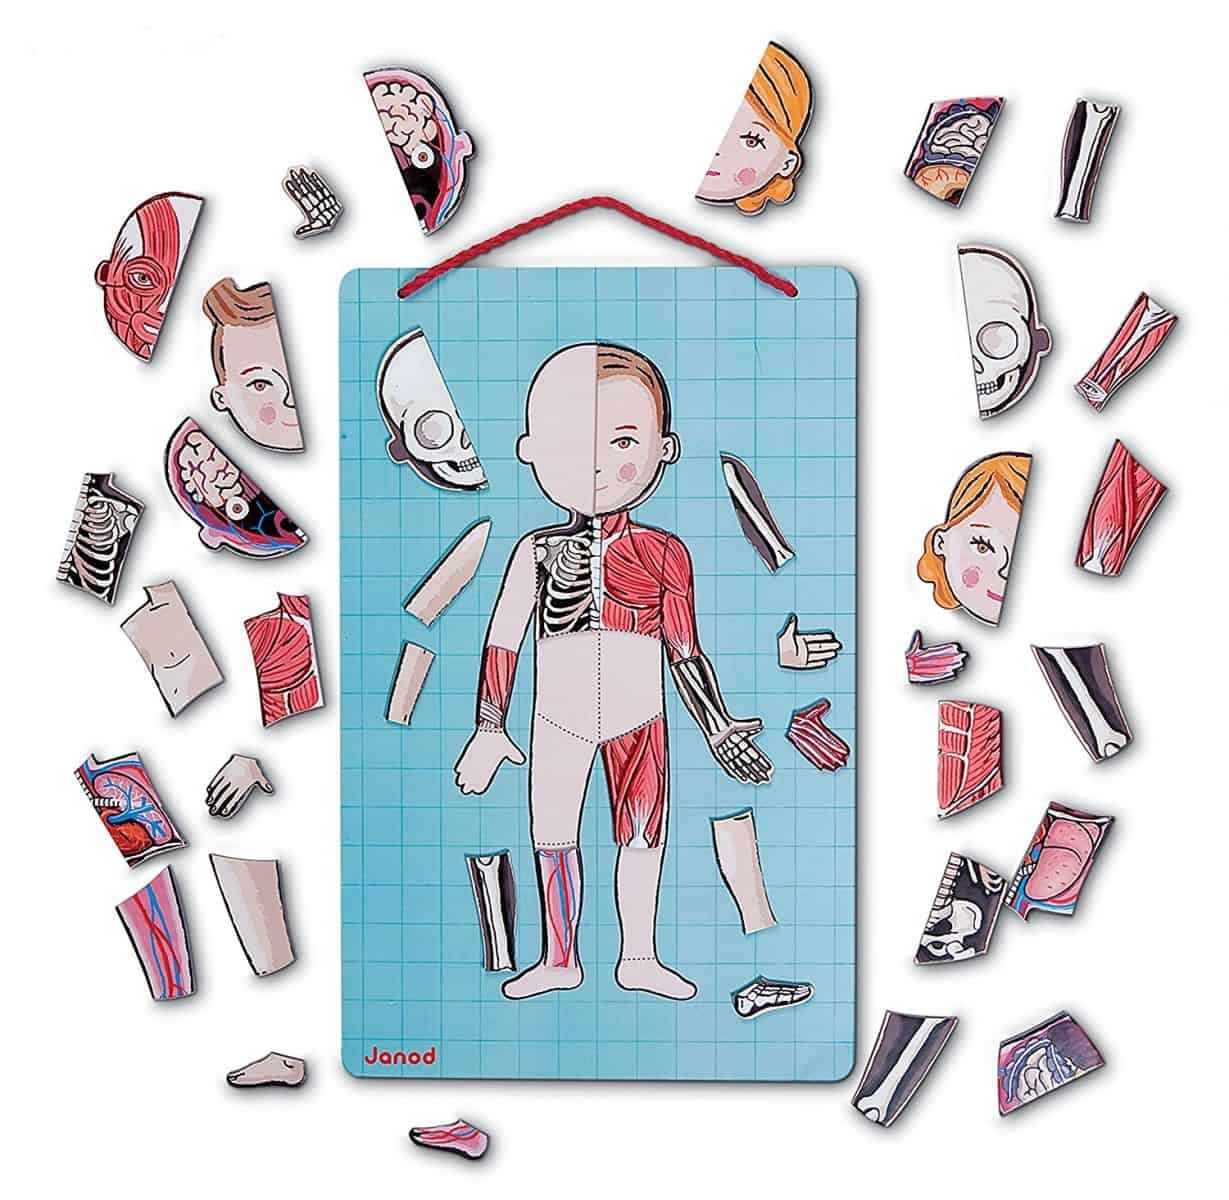 10 Fun Ways To Teach Kids Anatomy Education Pinterest Teaching